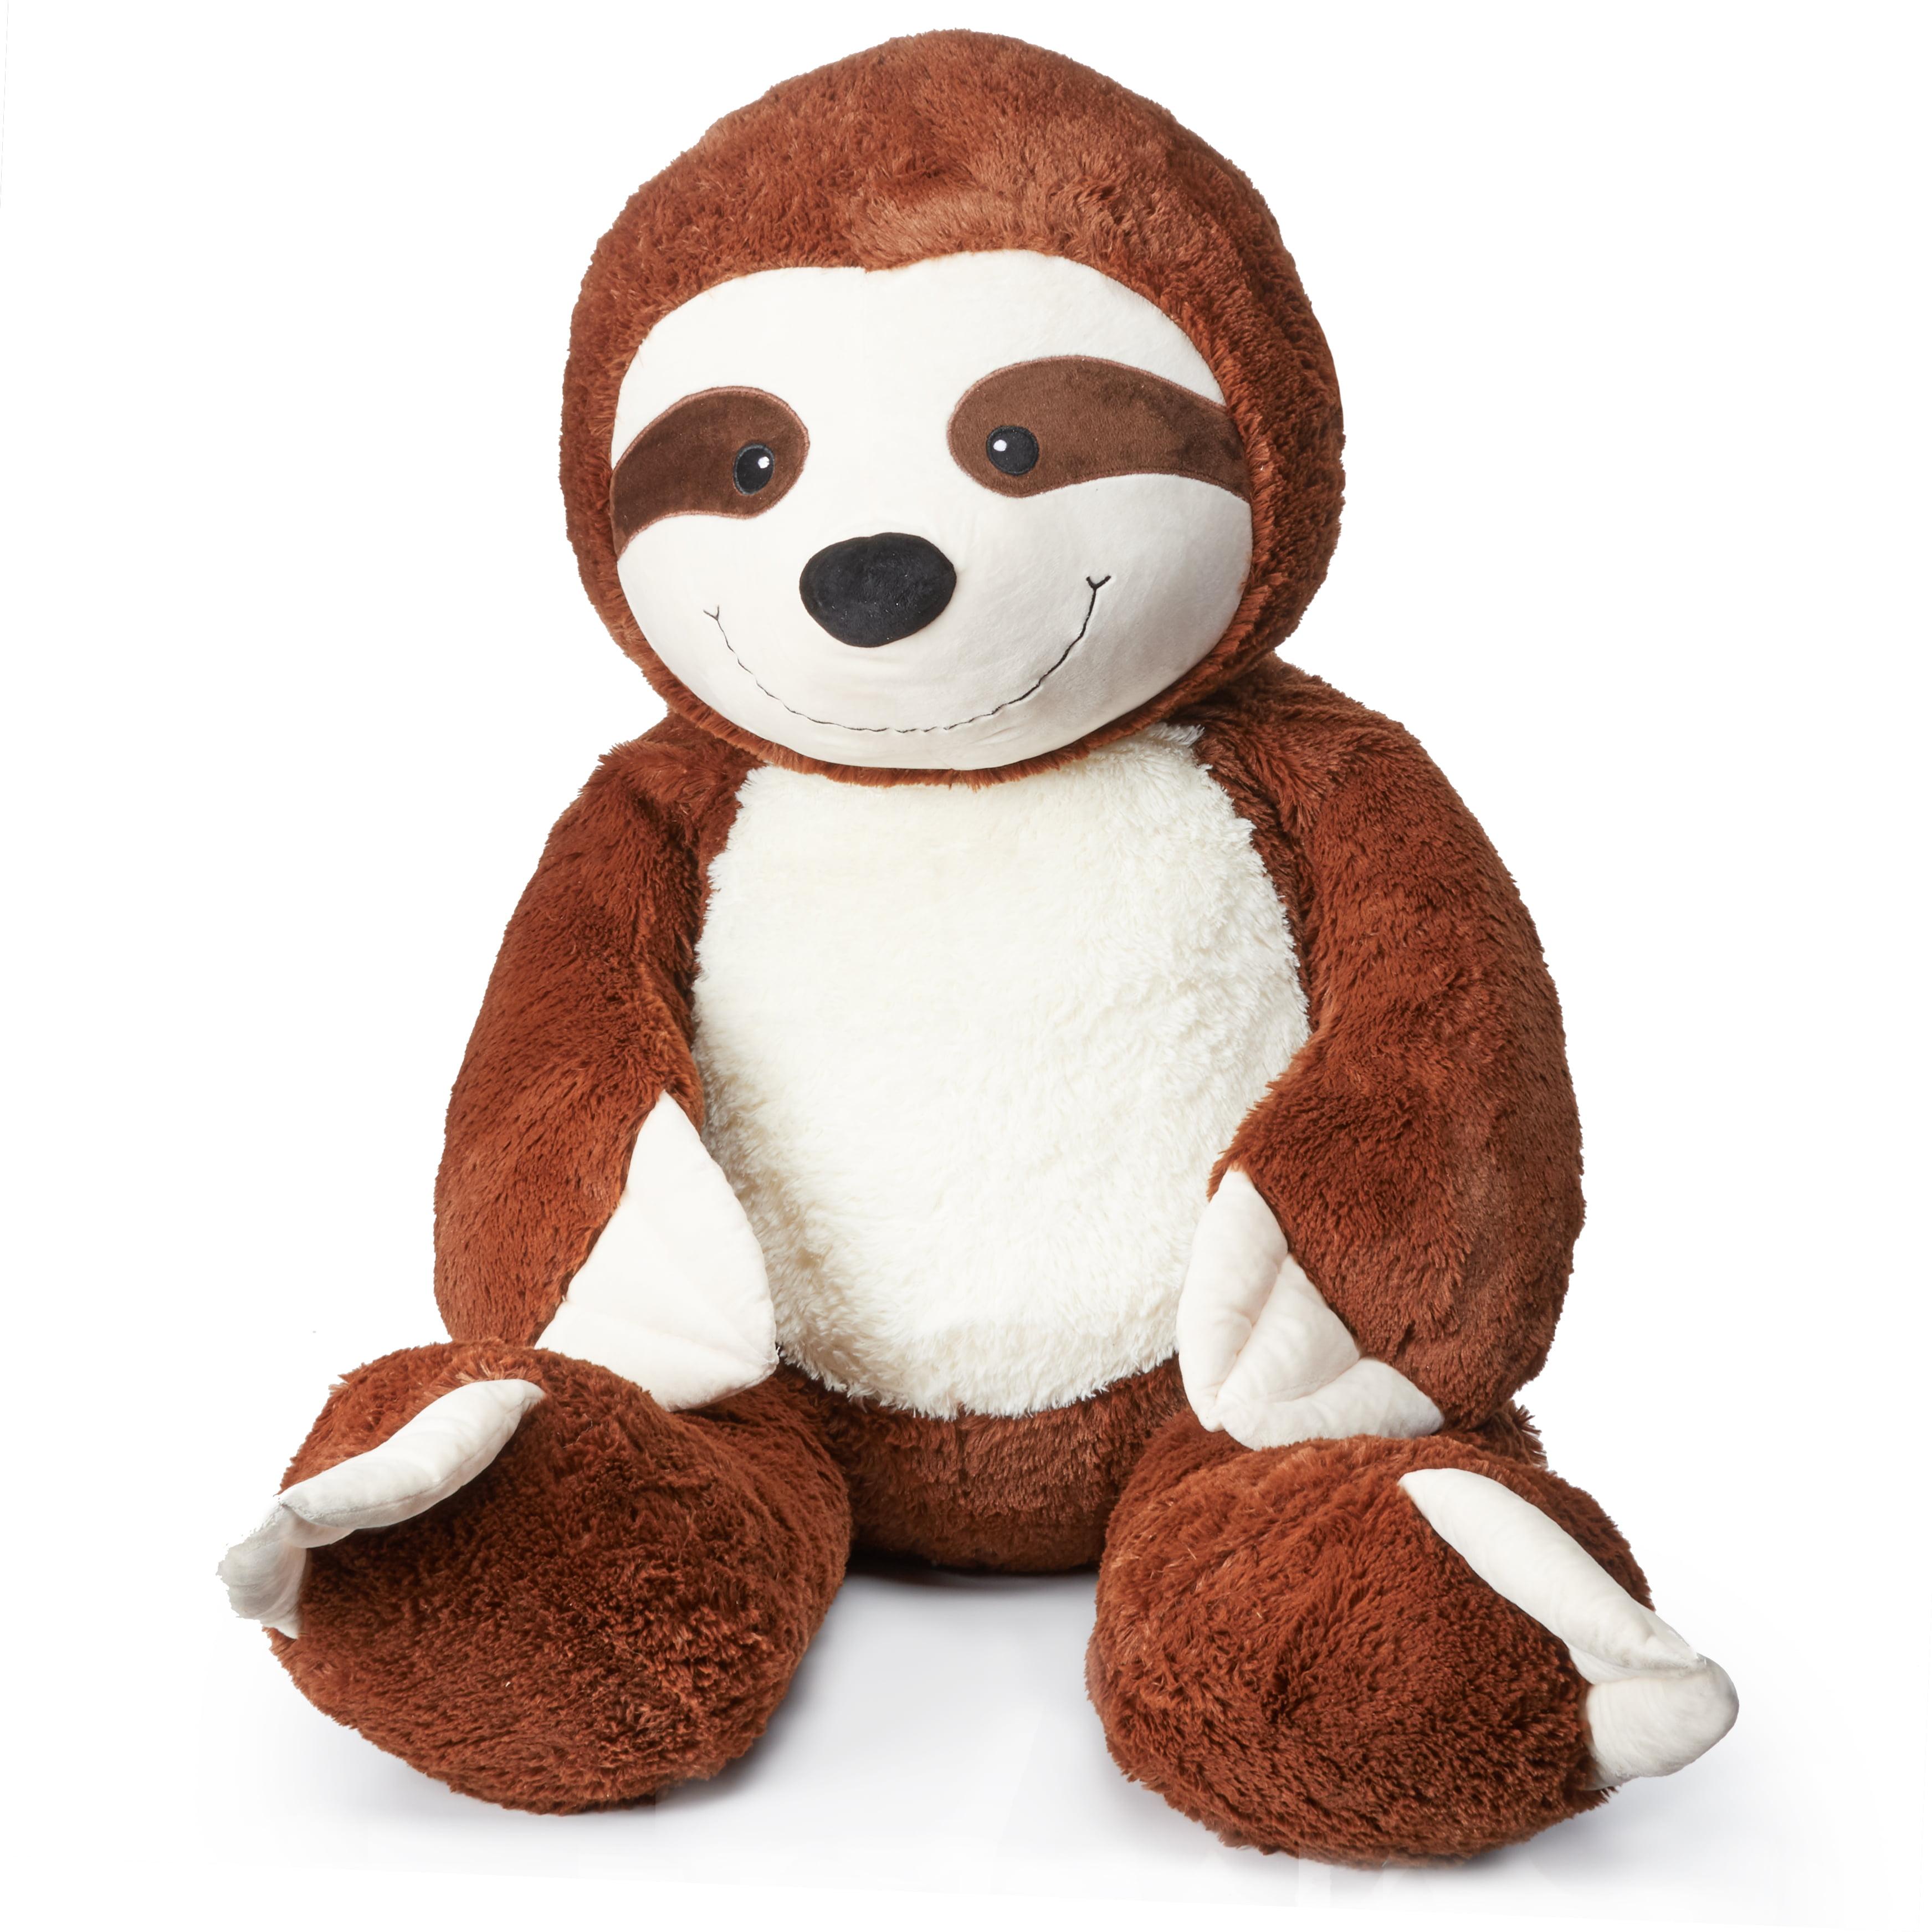 Giant Plush Sloth 35 Walmart Inventory Checker Brickseek